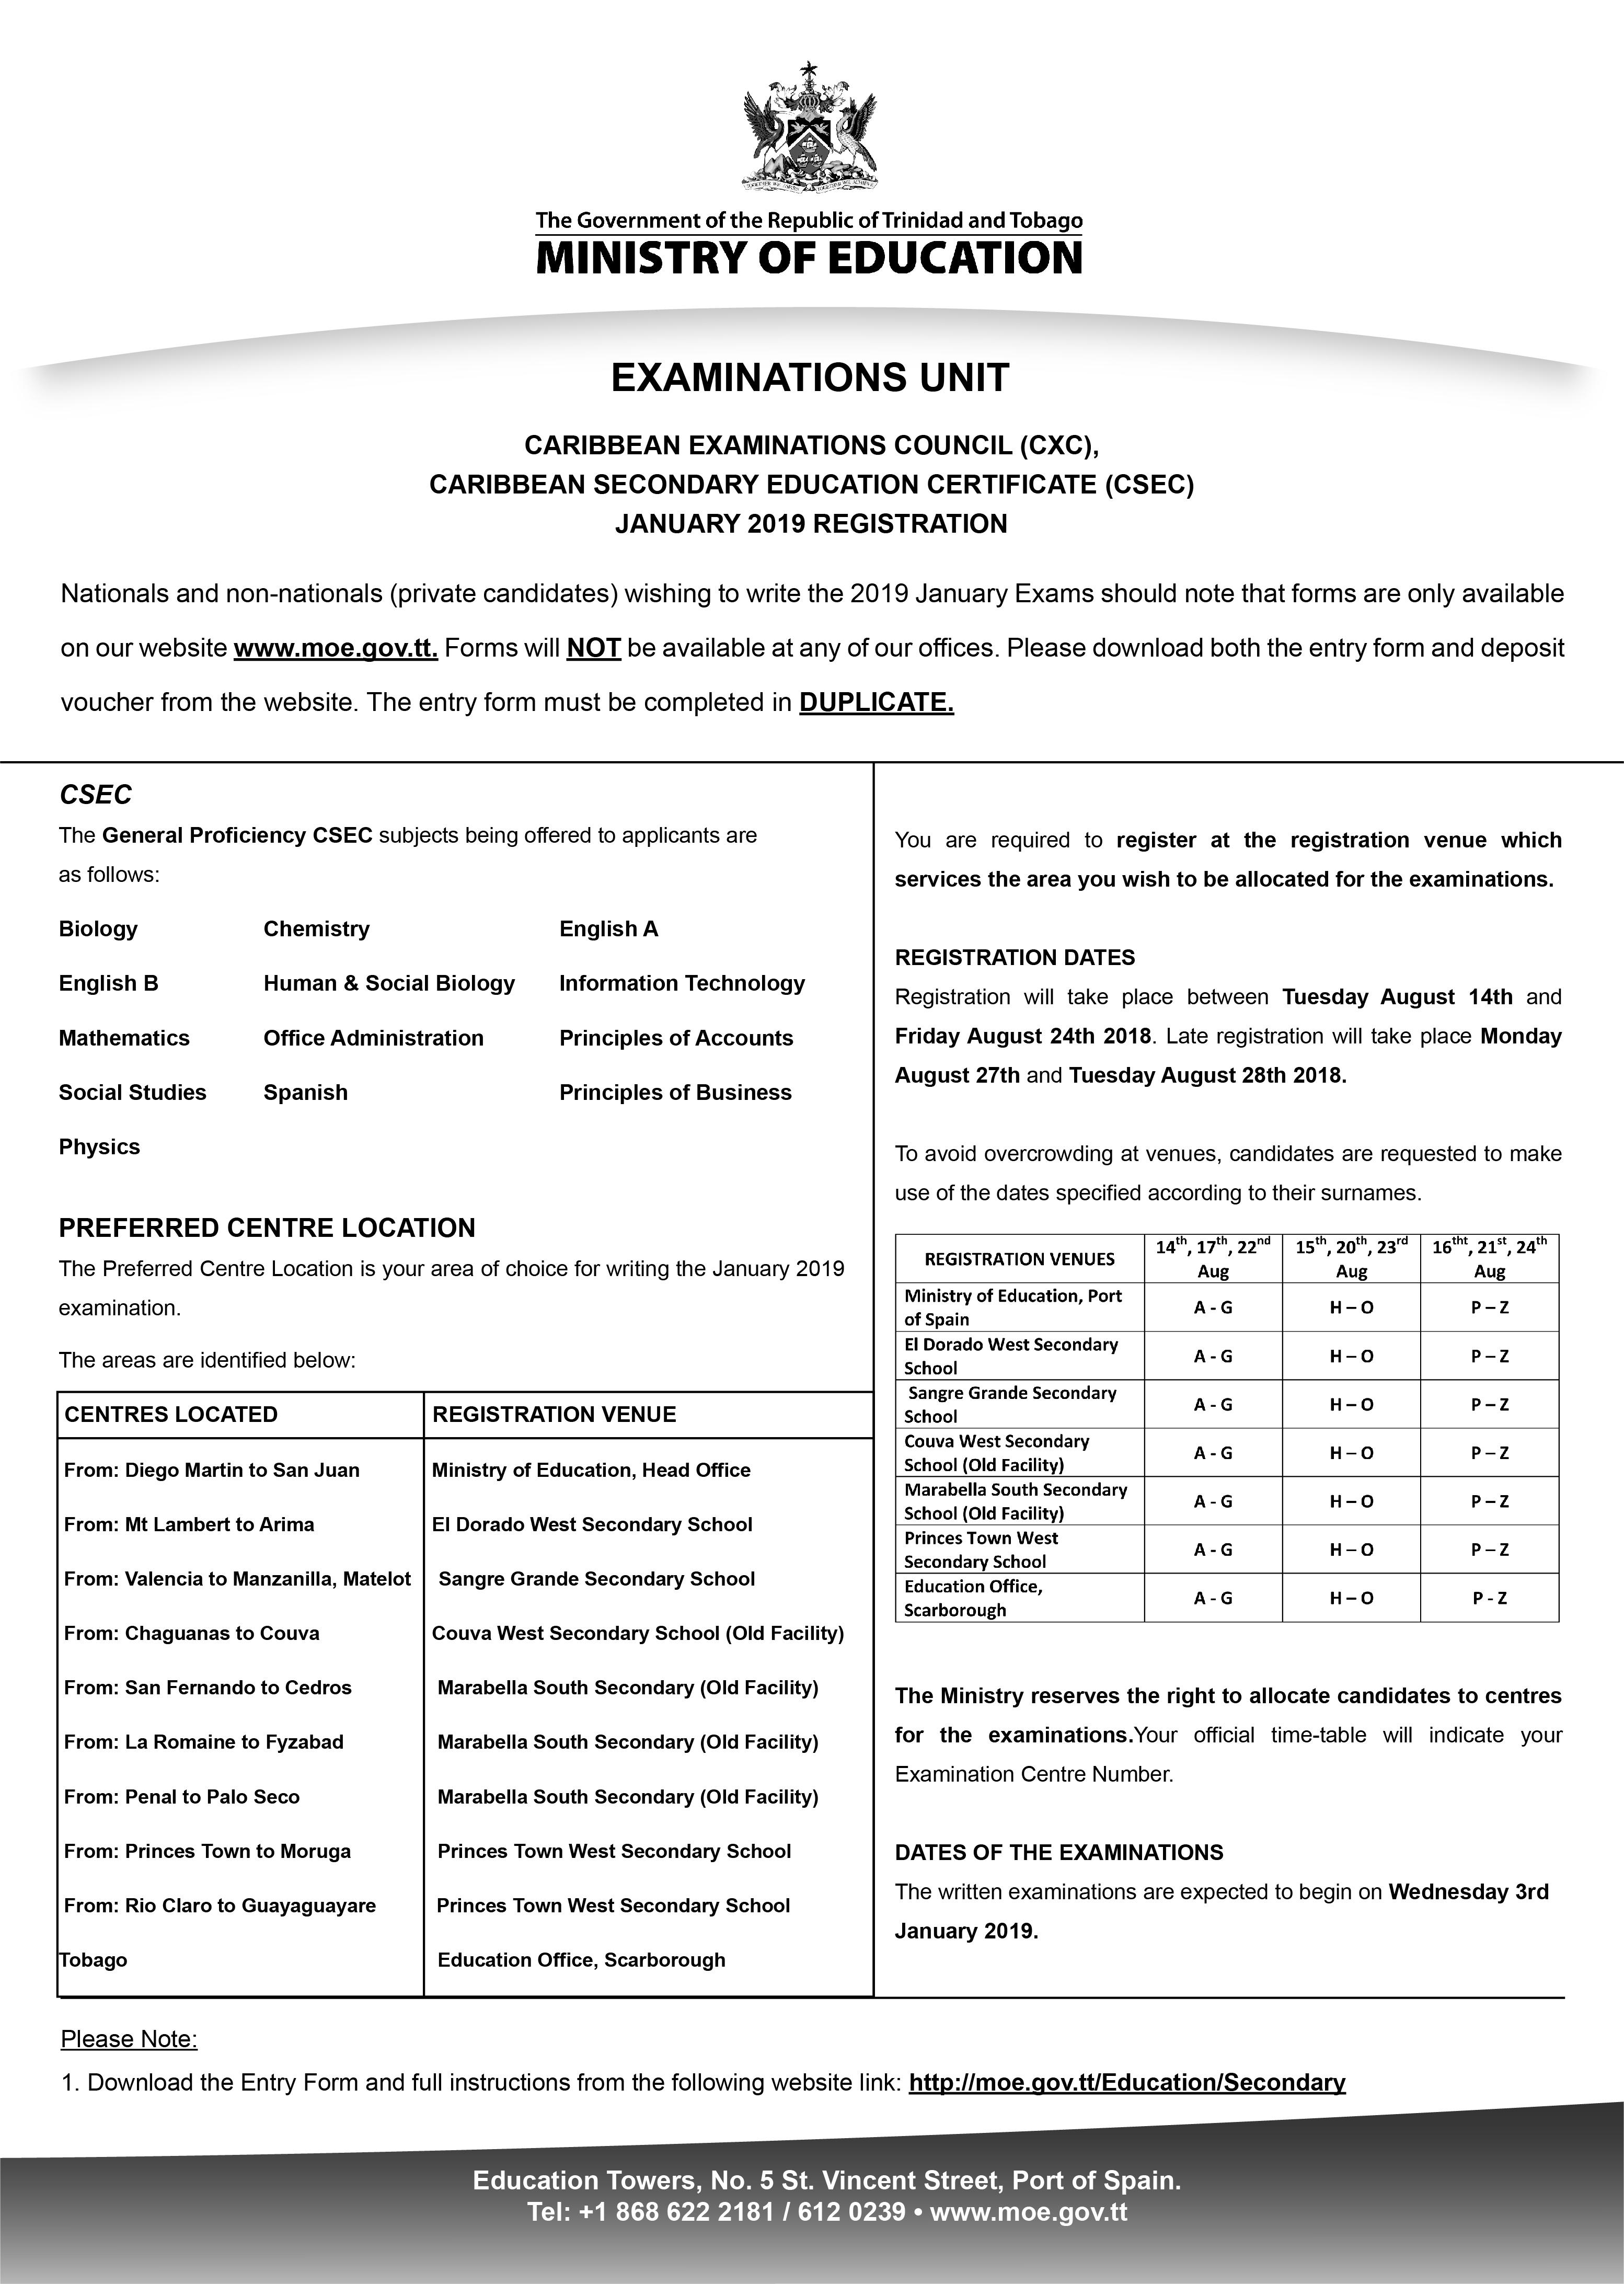 CSEC 2019 January Exams Registration Forms, Instructions ...